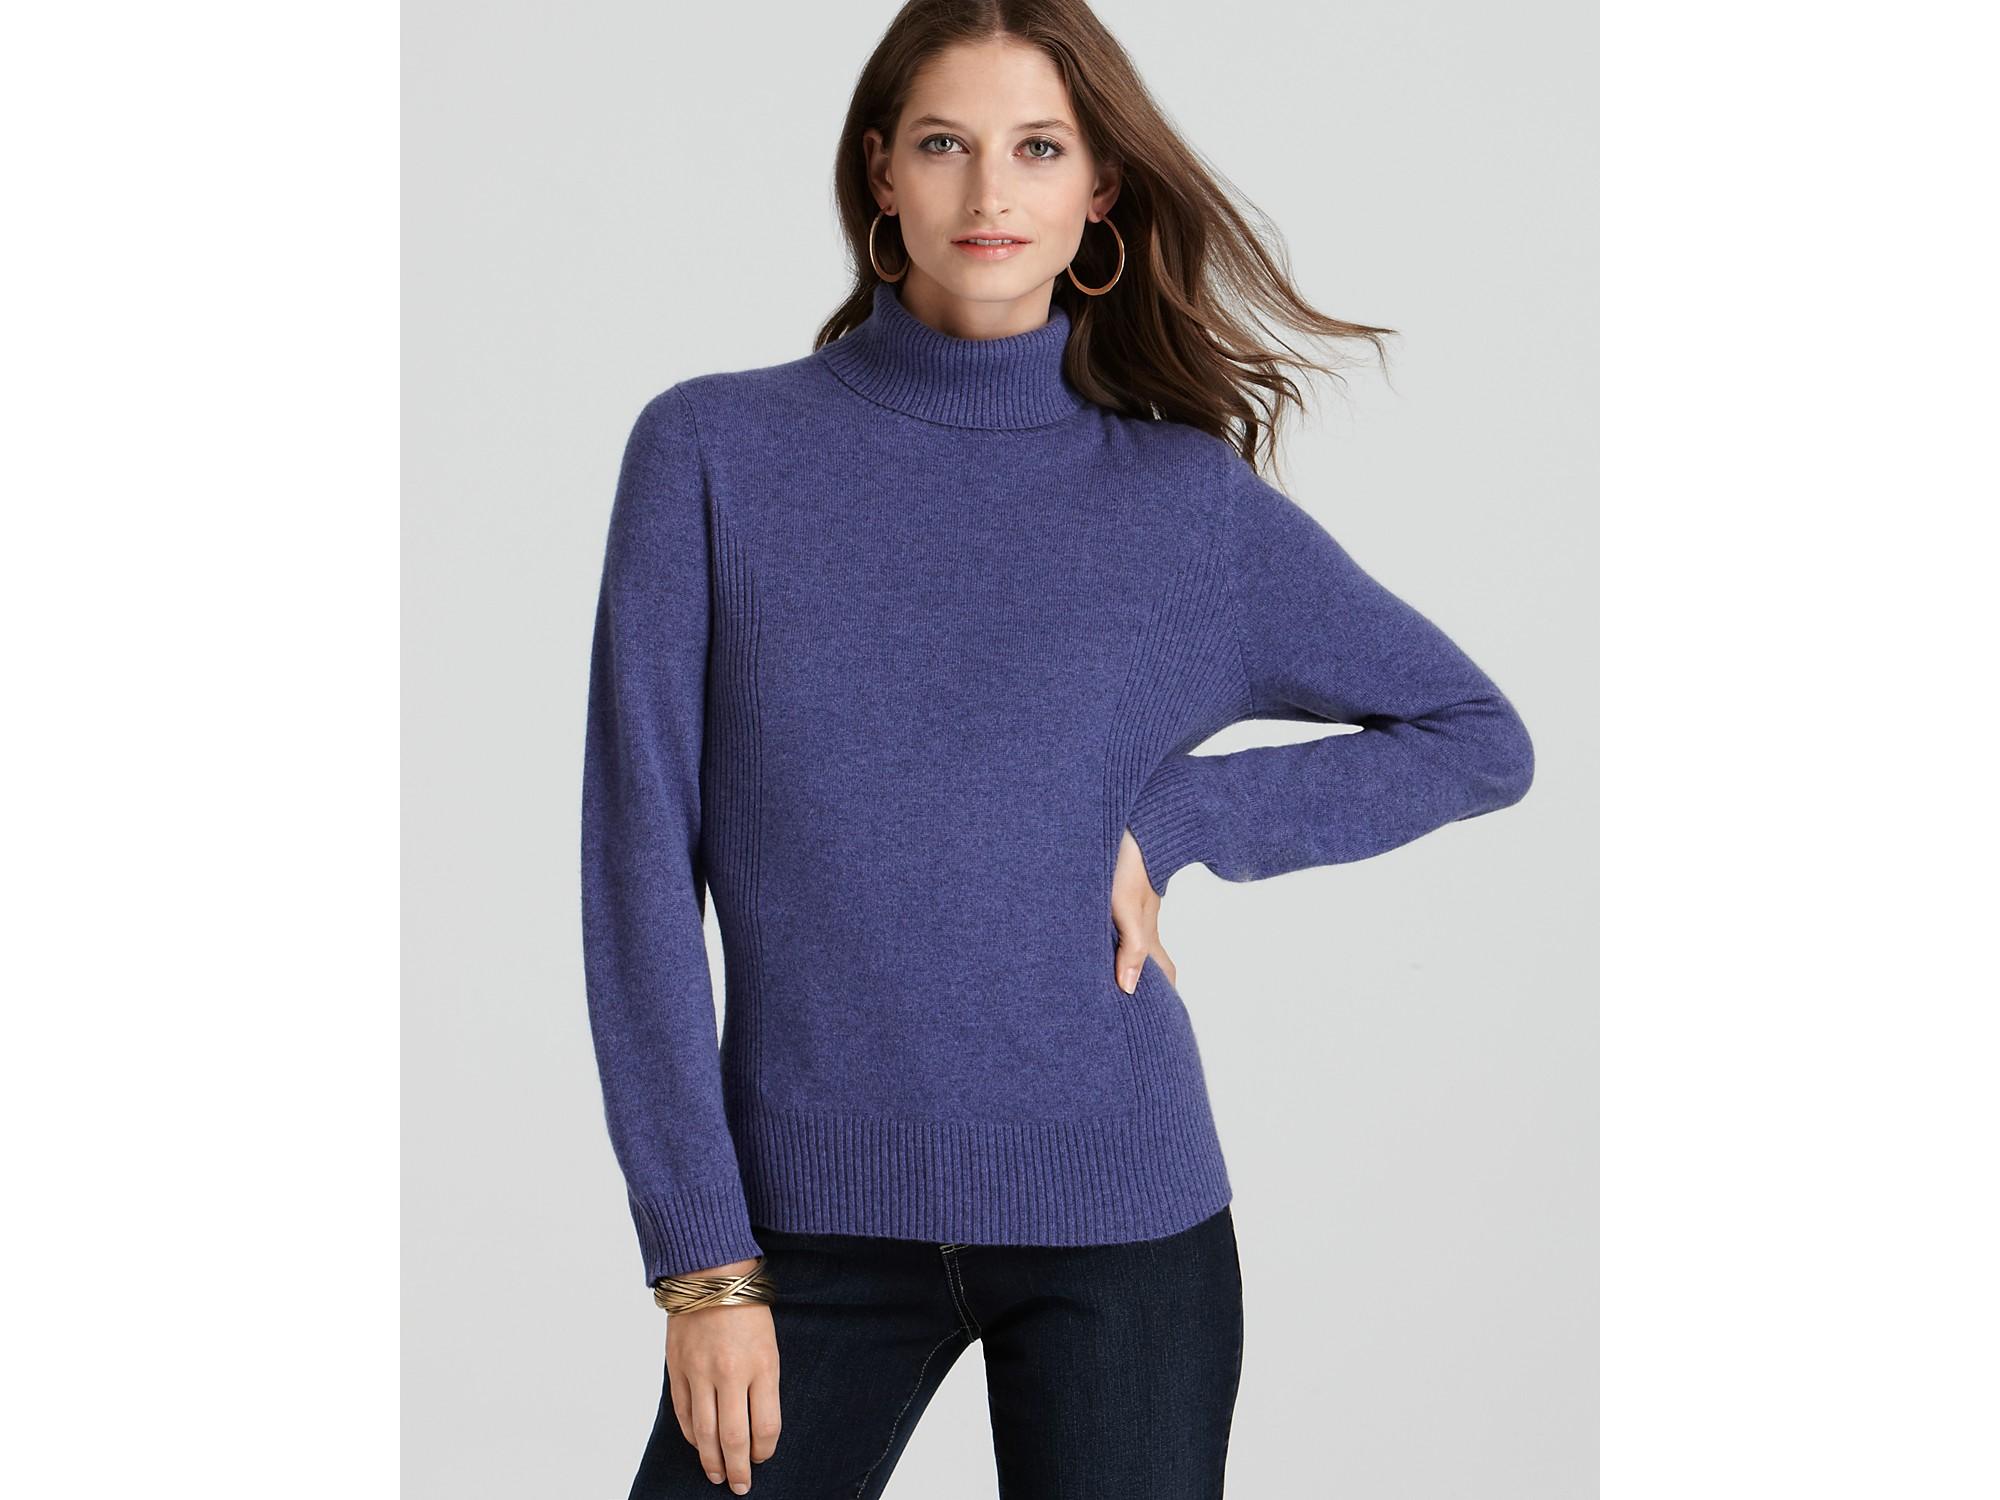 Lyst Ash Jones New York Collection Cashmere Turtleneck Sweater In Purple